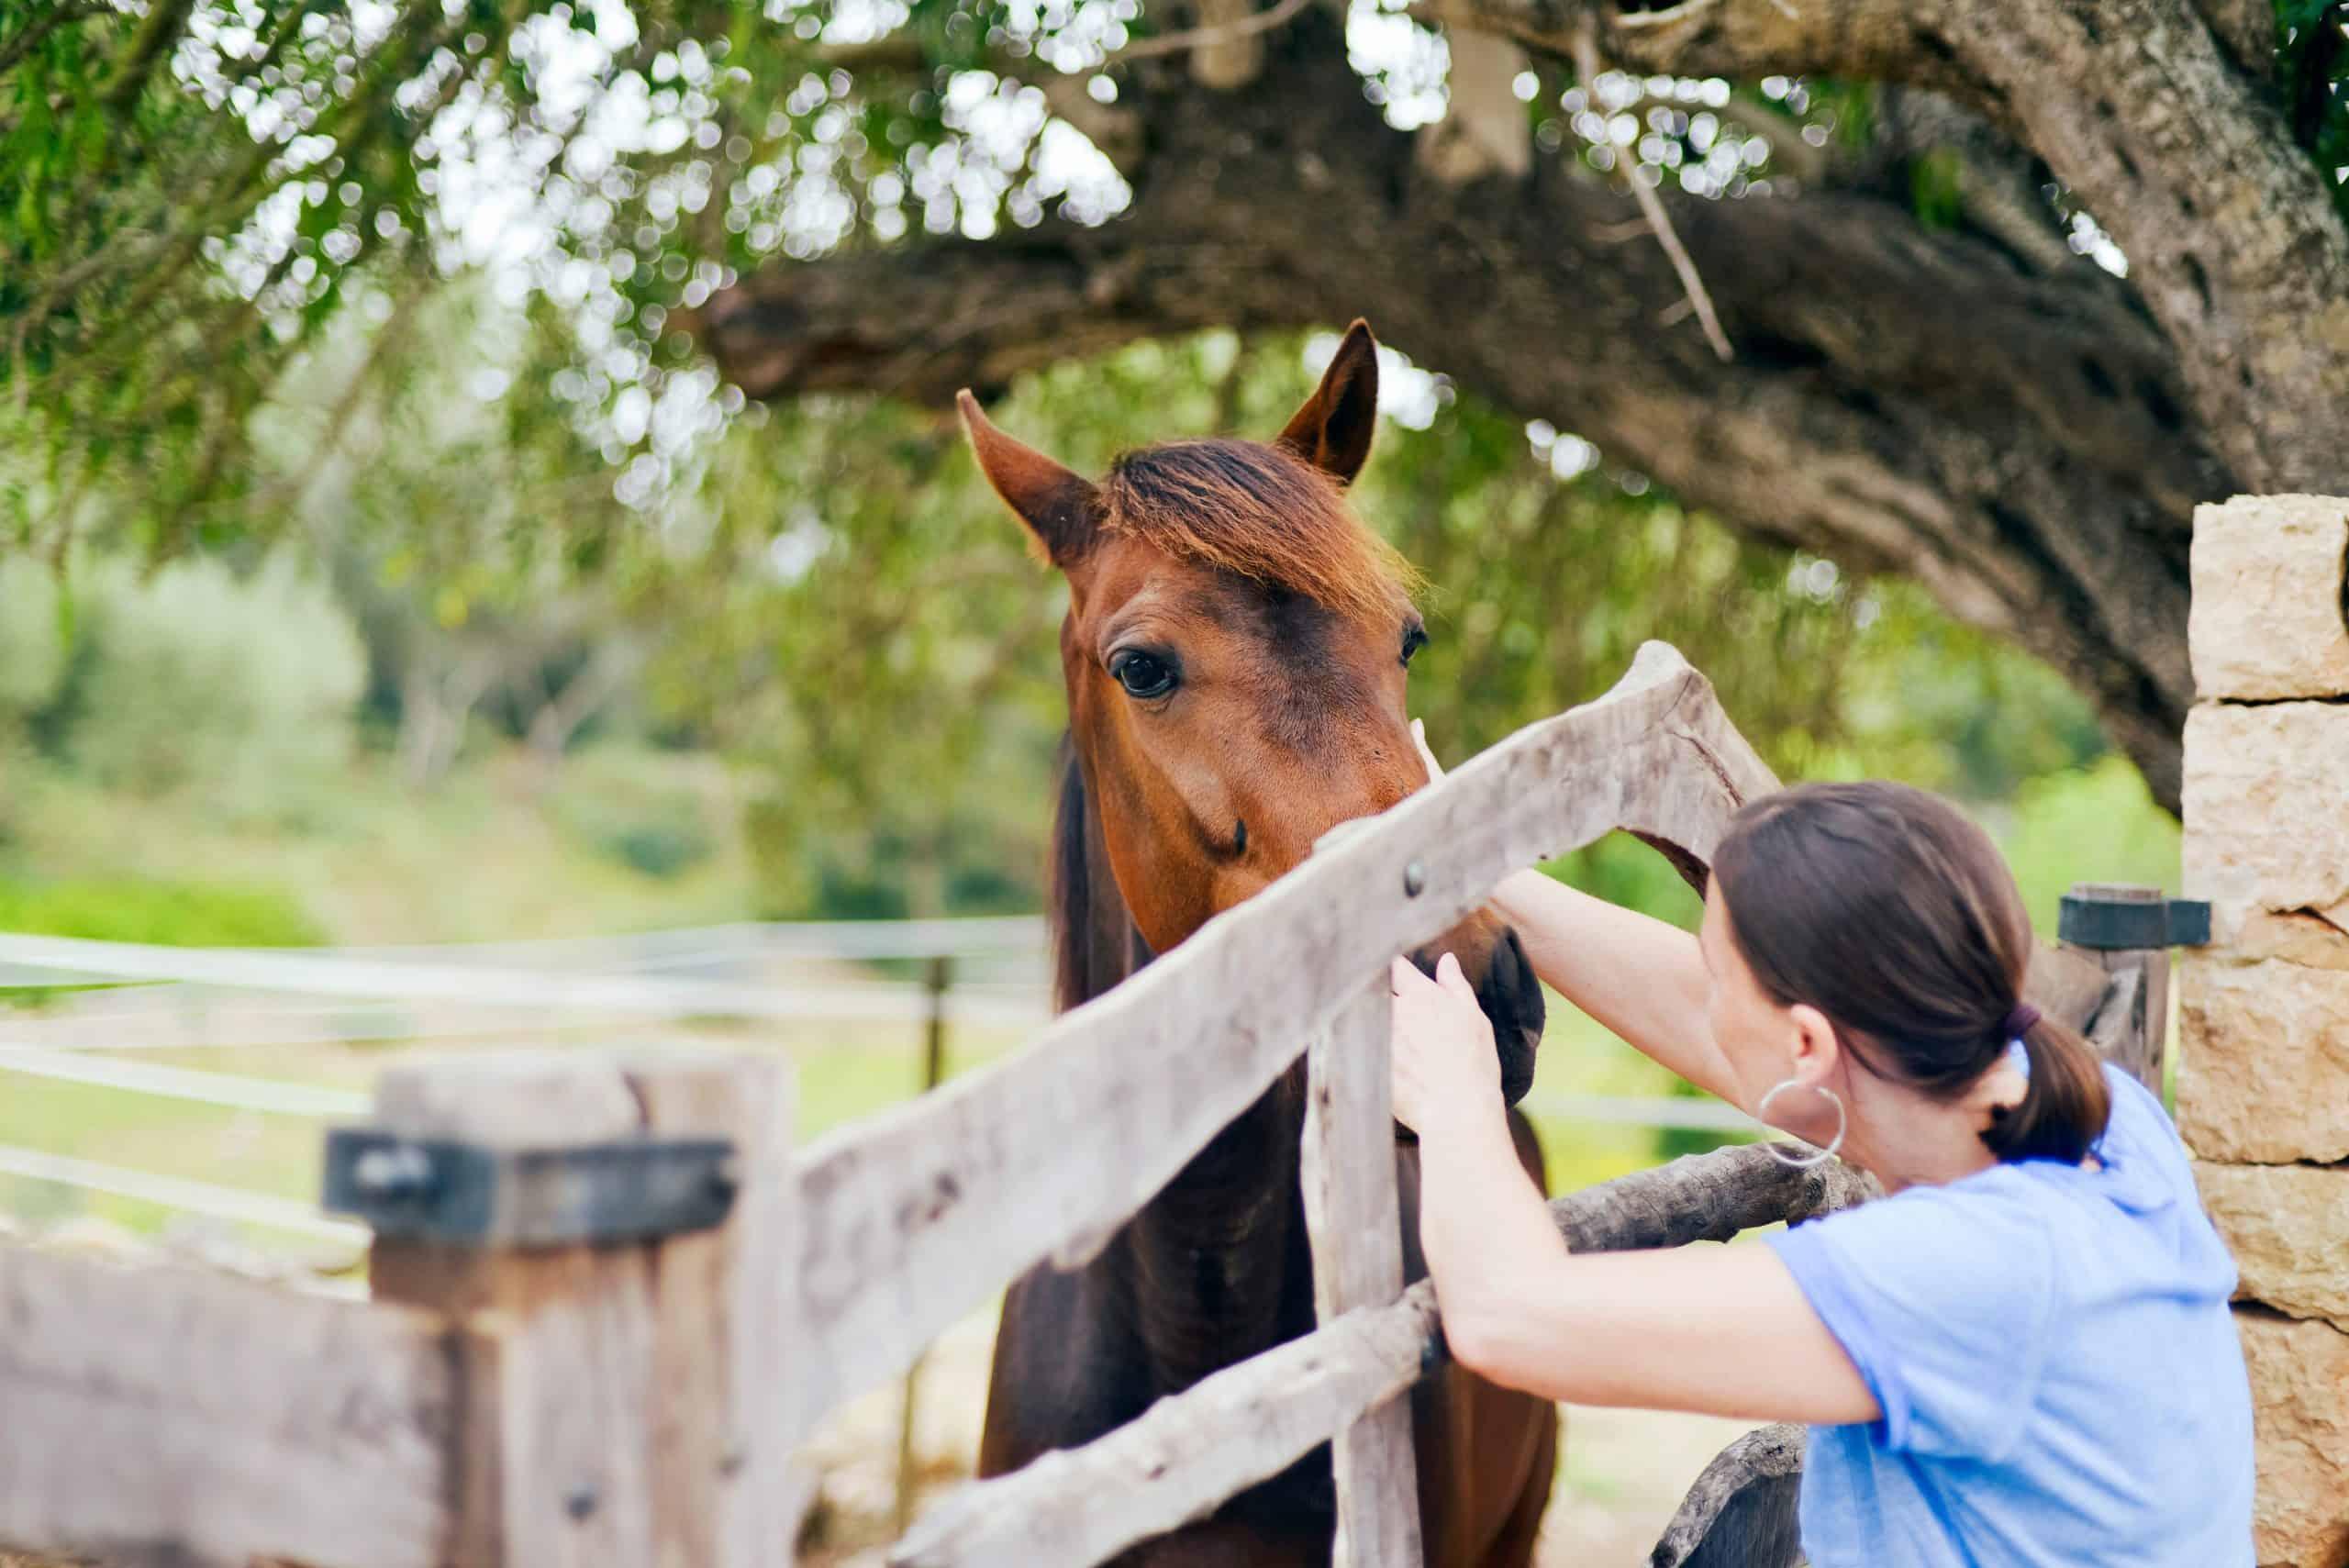 Brunette woman cuddling horse through wooden fence